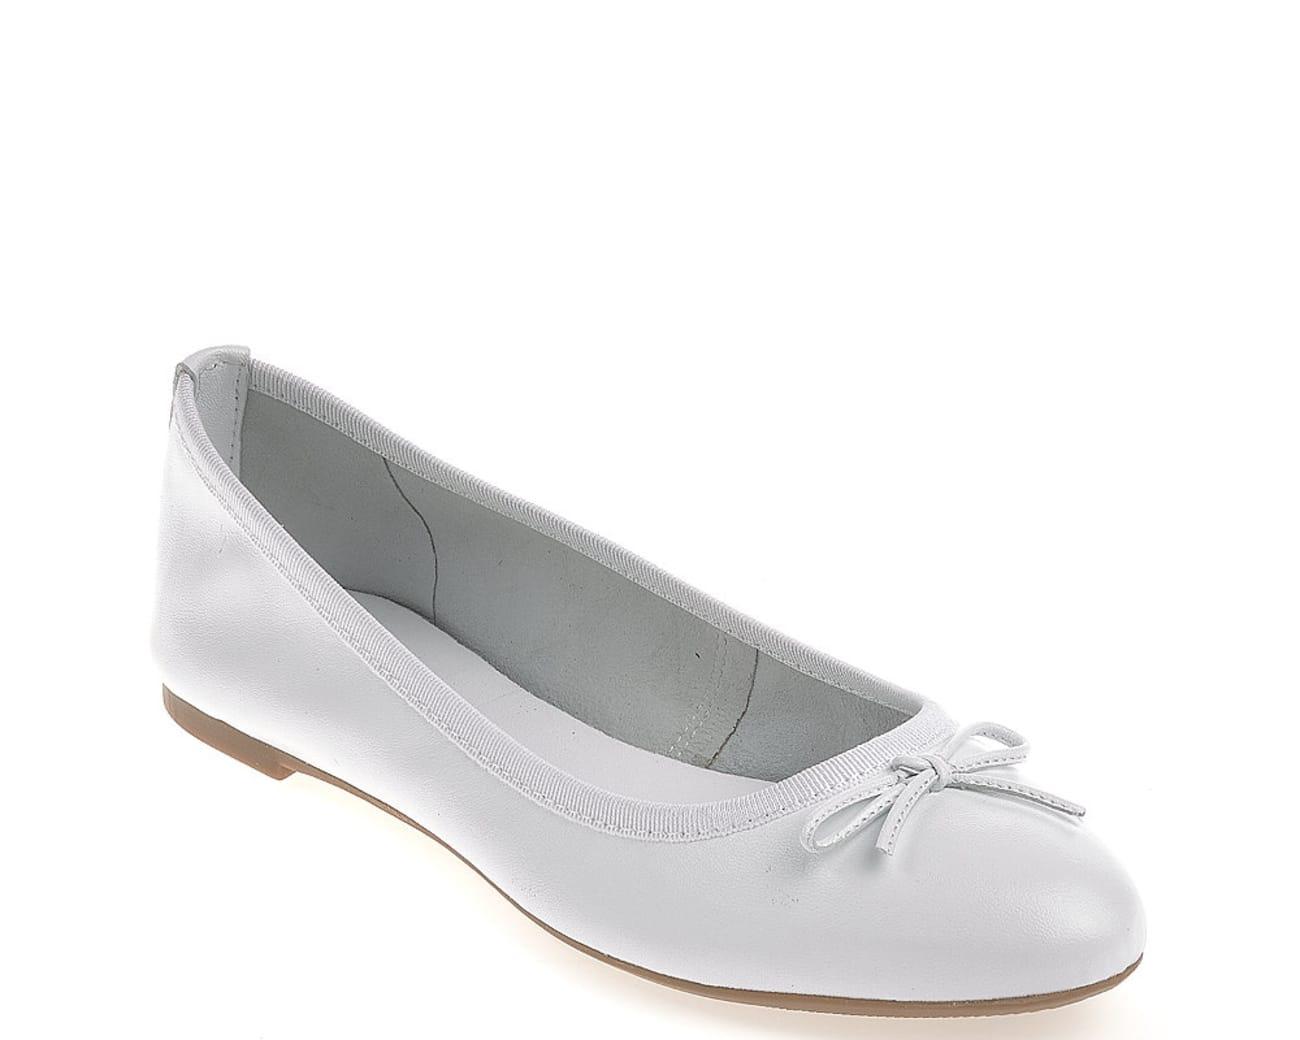 fbb8ba991d3aa Ballerina | Varese - Schuhe mit italienischem Flair